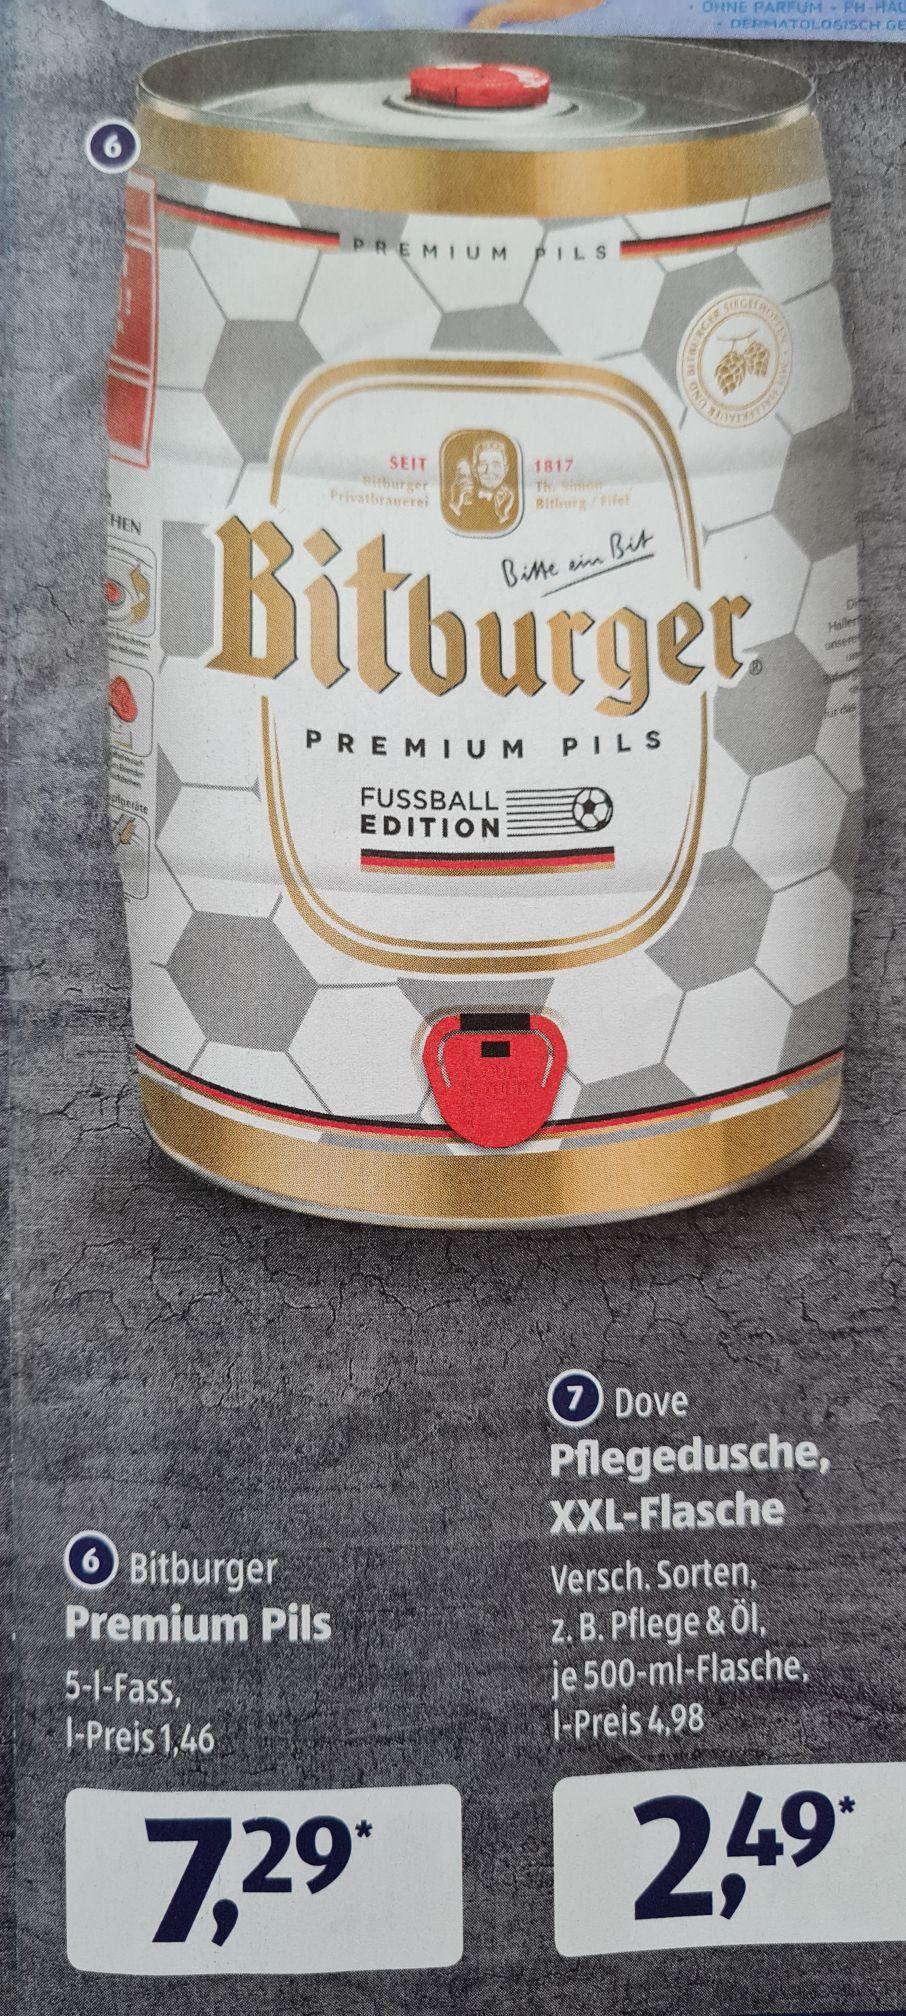 Bitburger Premium Pils 5 Liter Fass Fussball Edition ab Freitag den 07.05 Aldi Süd